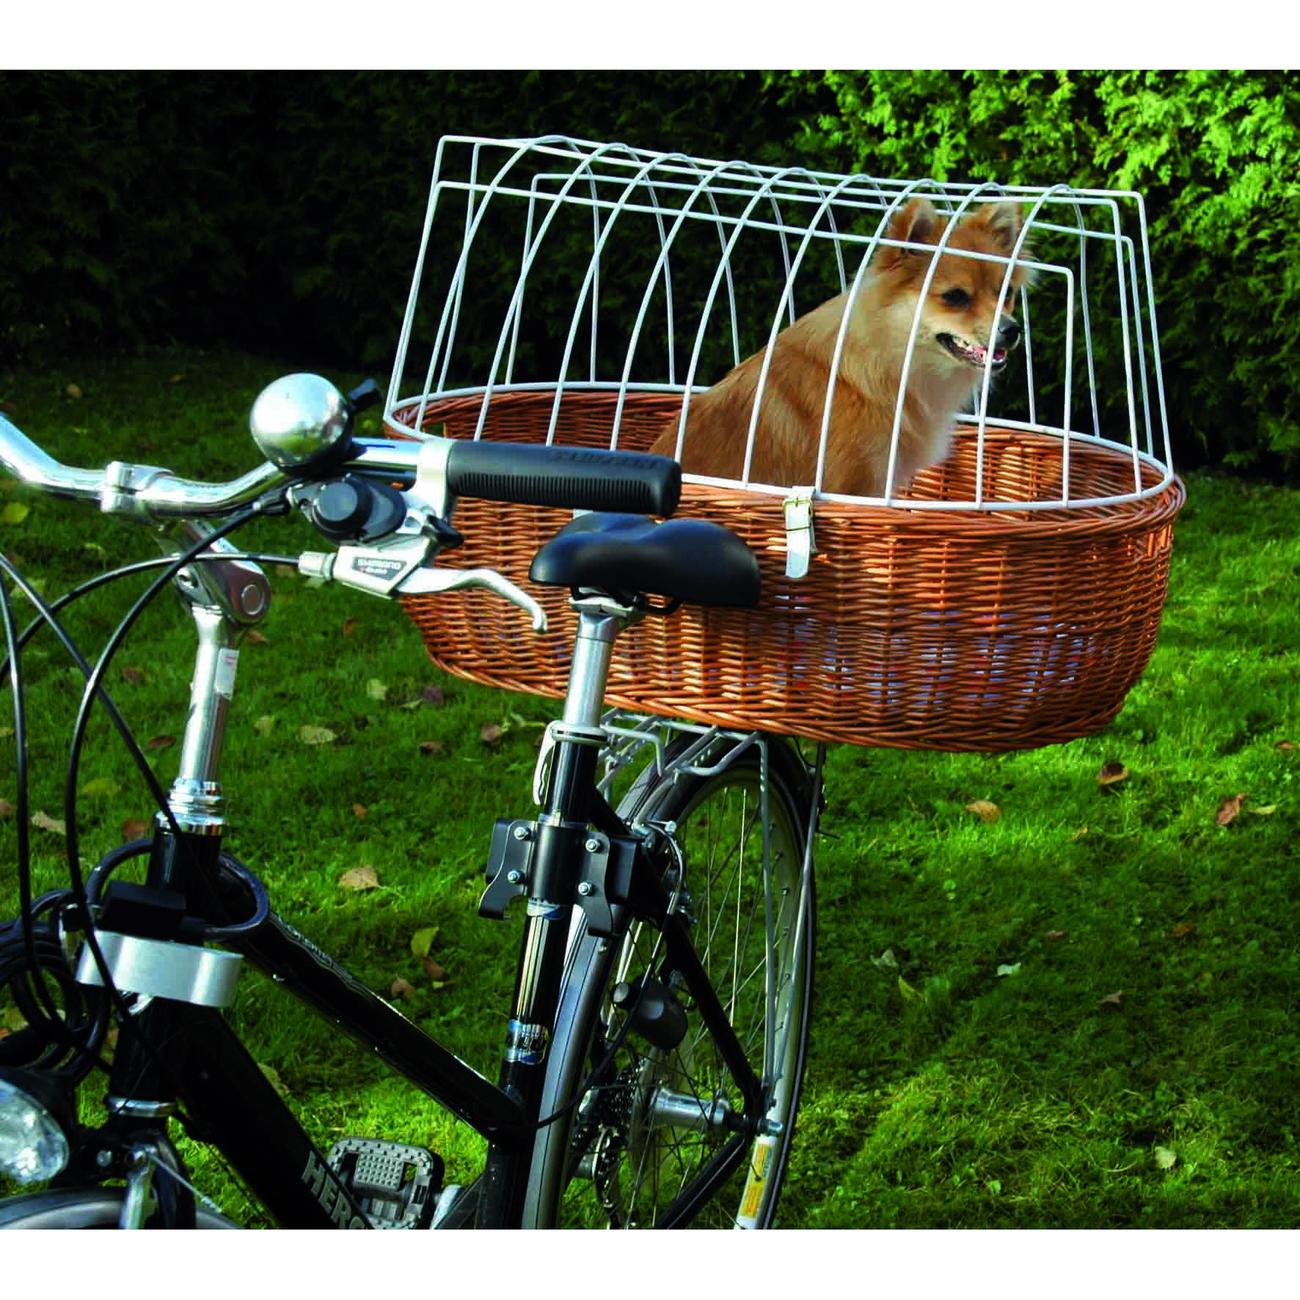 Aumüller Hunde Fahrradkorb XXL für Gepäckträger, XXL - 74 cm x 51 cm x 22/48 cm